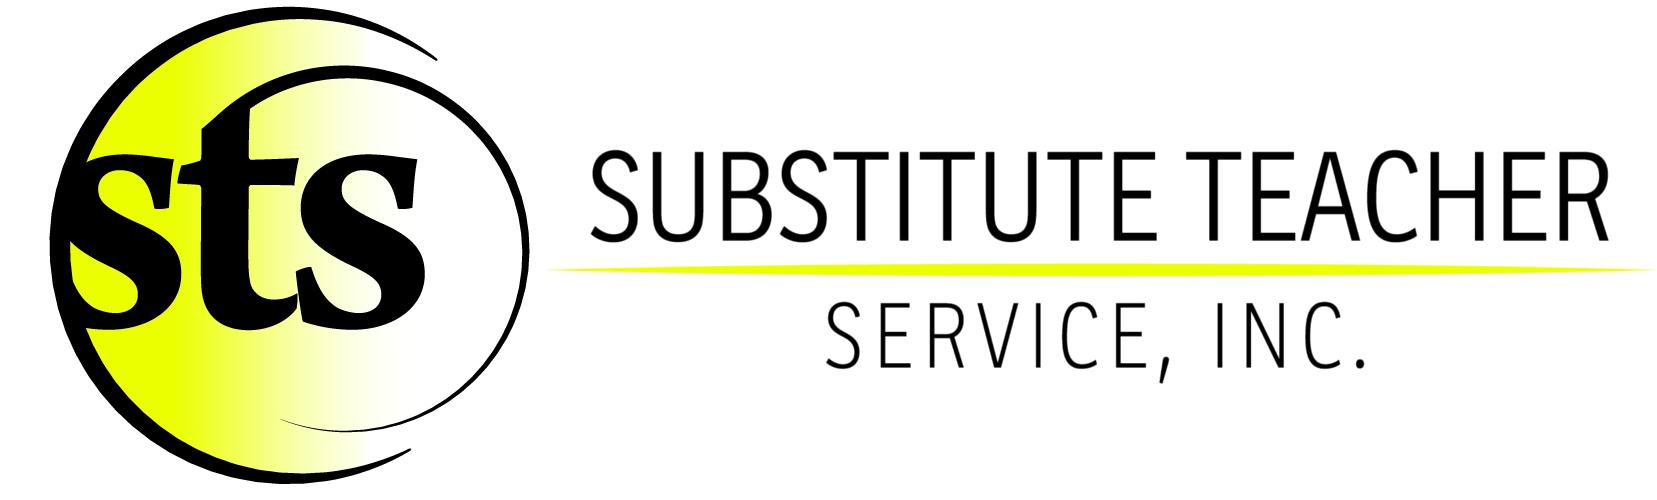 Home substitute teacher service inc stslogofinalg xflitez Gallery